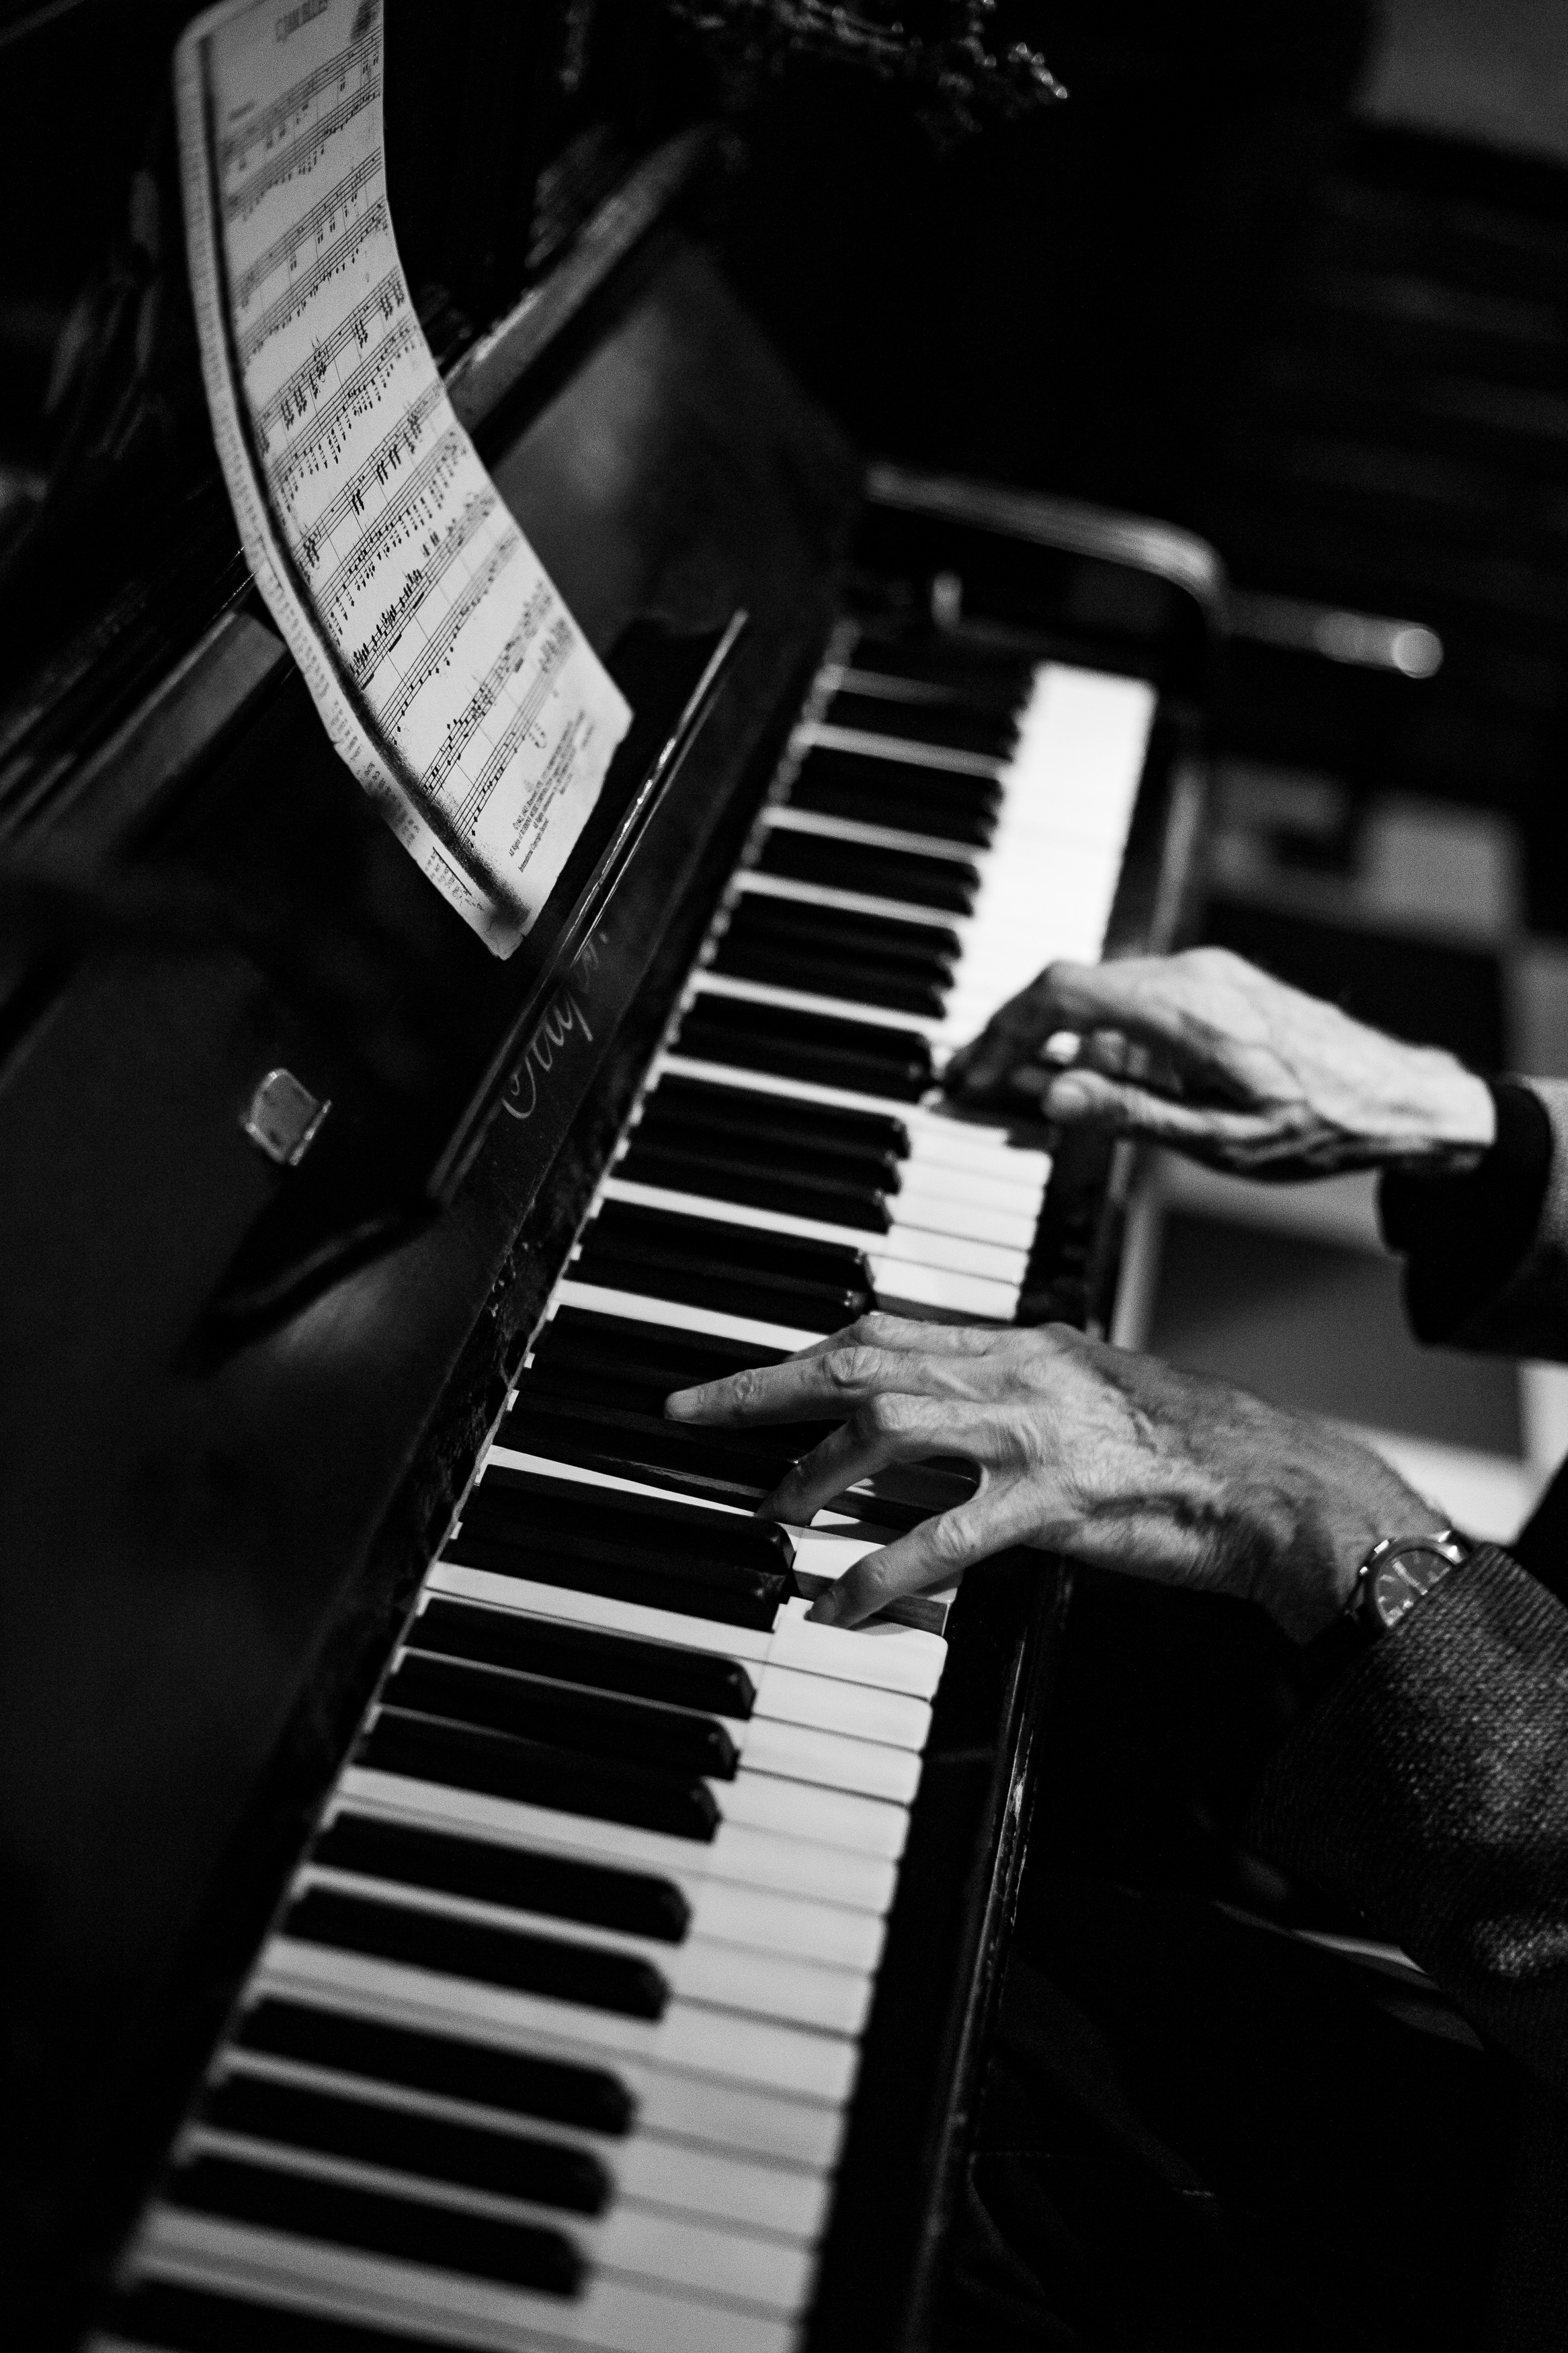 Kat Ciemiega photography, music photographer, pianist, piano, Moscow music